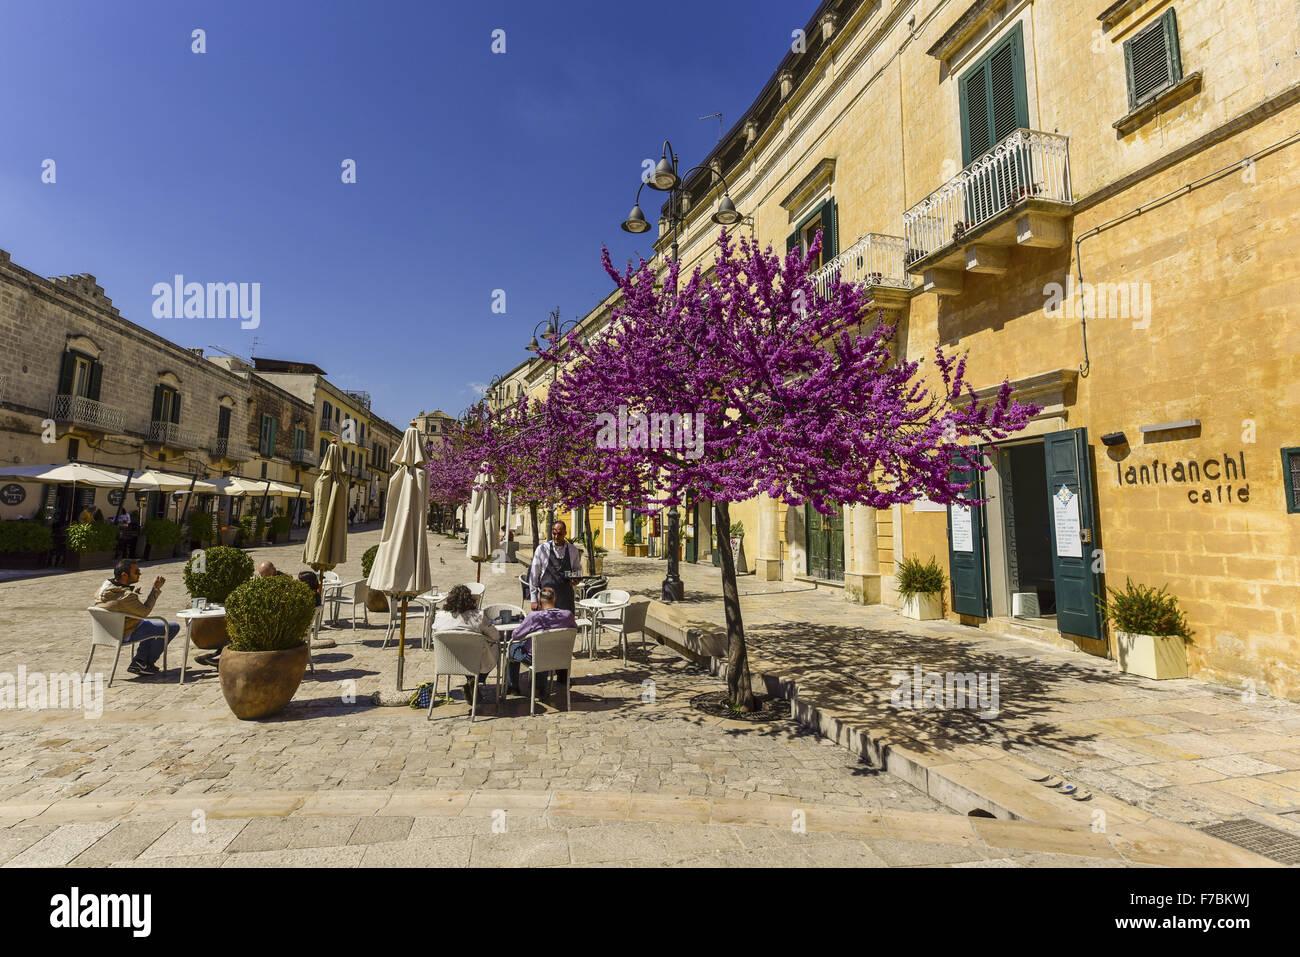 European Cultural Capital 2019, Matera, Basilicata, Italy - Stock Image